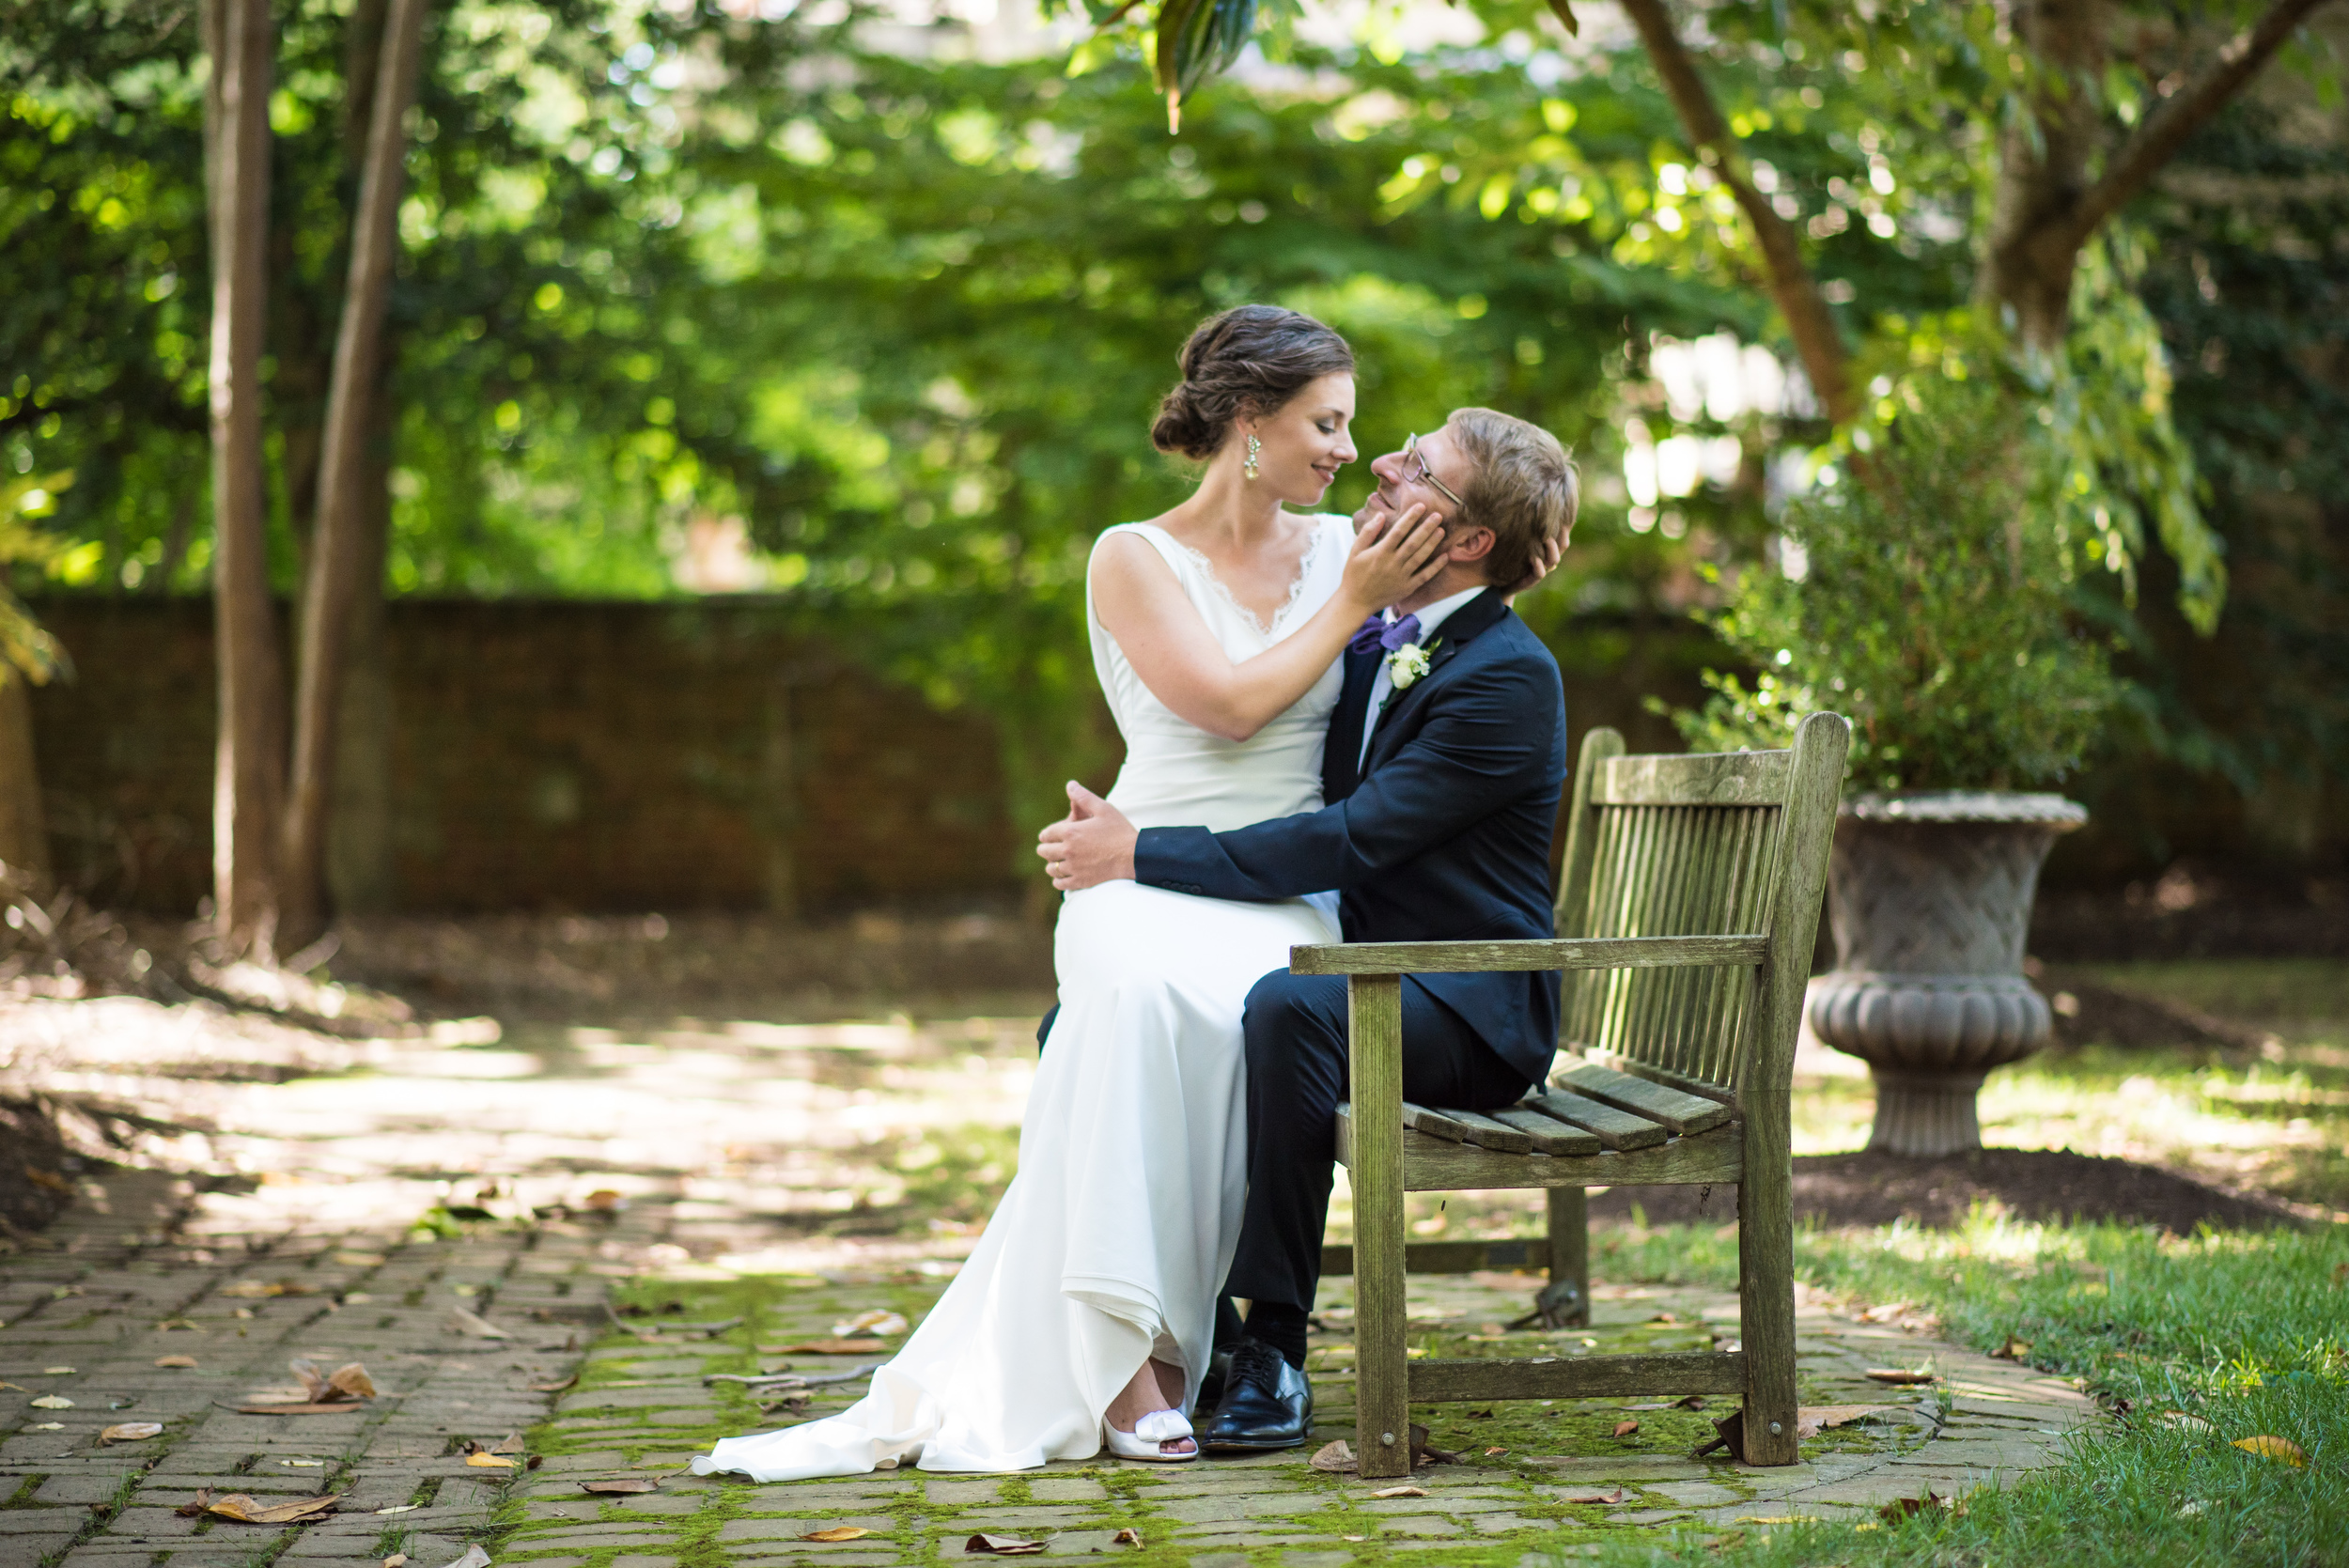 portraits-wedding_0003.jpg